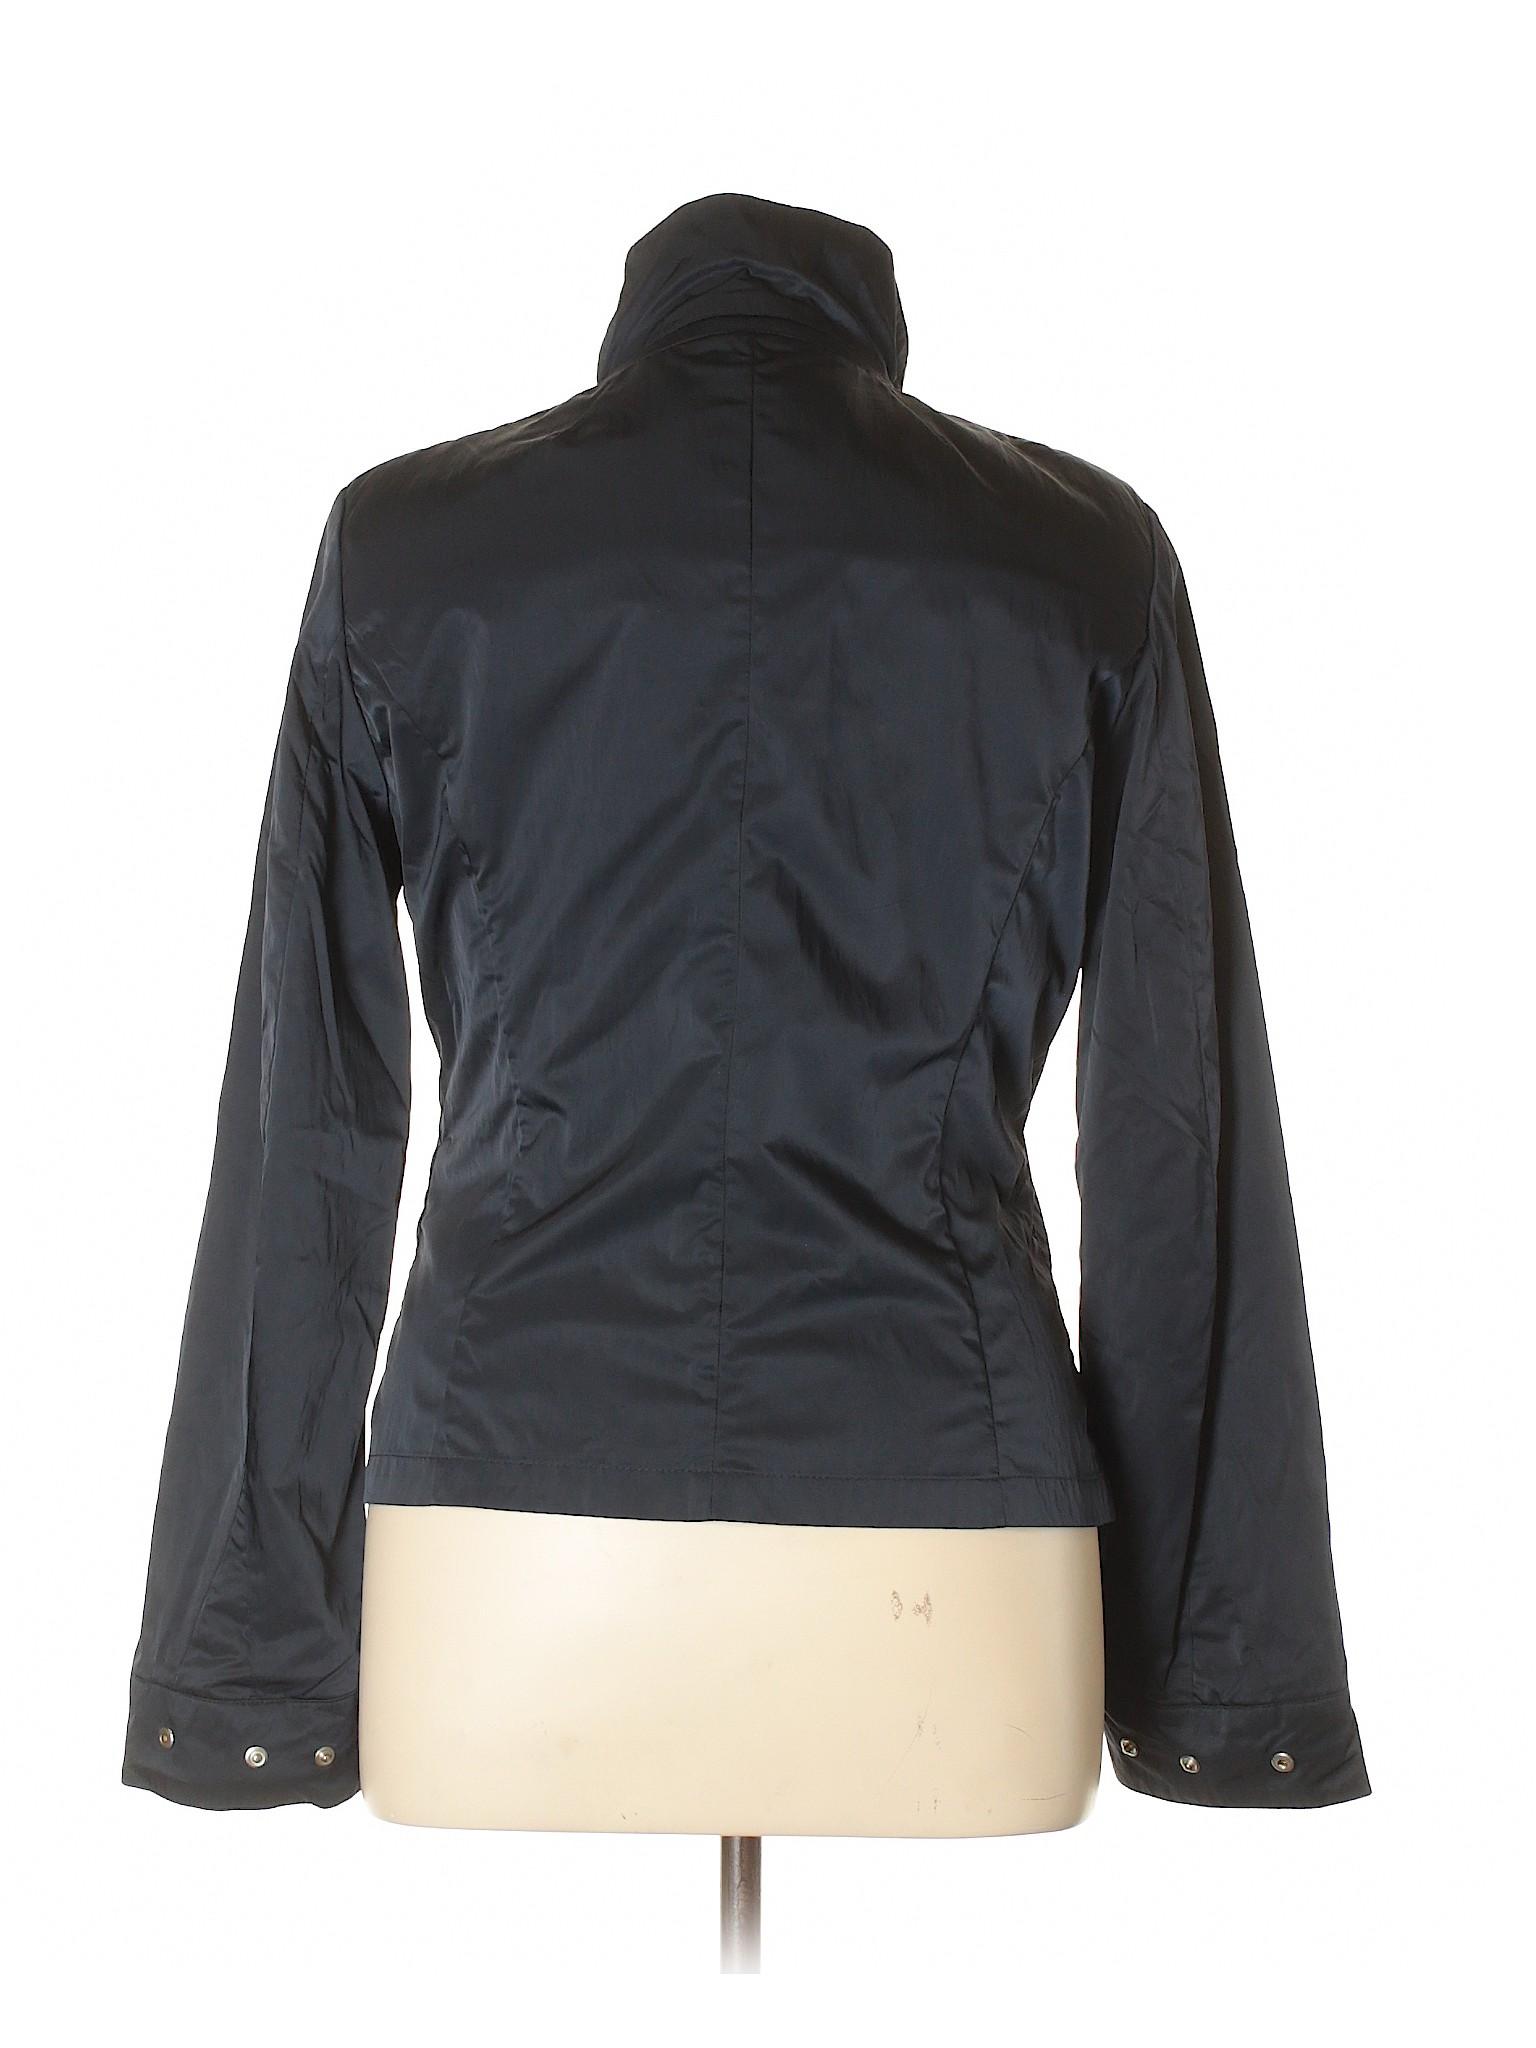 Jacket Boutique winter Geox Respira Respira Jacket Boutique Geox winter Boutique Uztq77nx